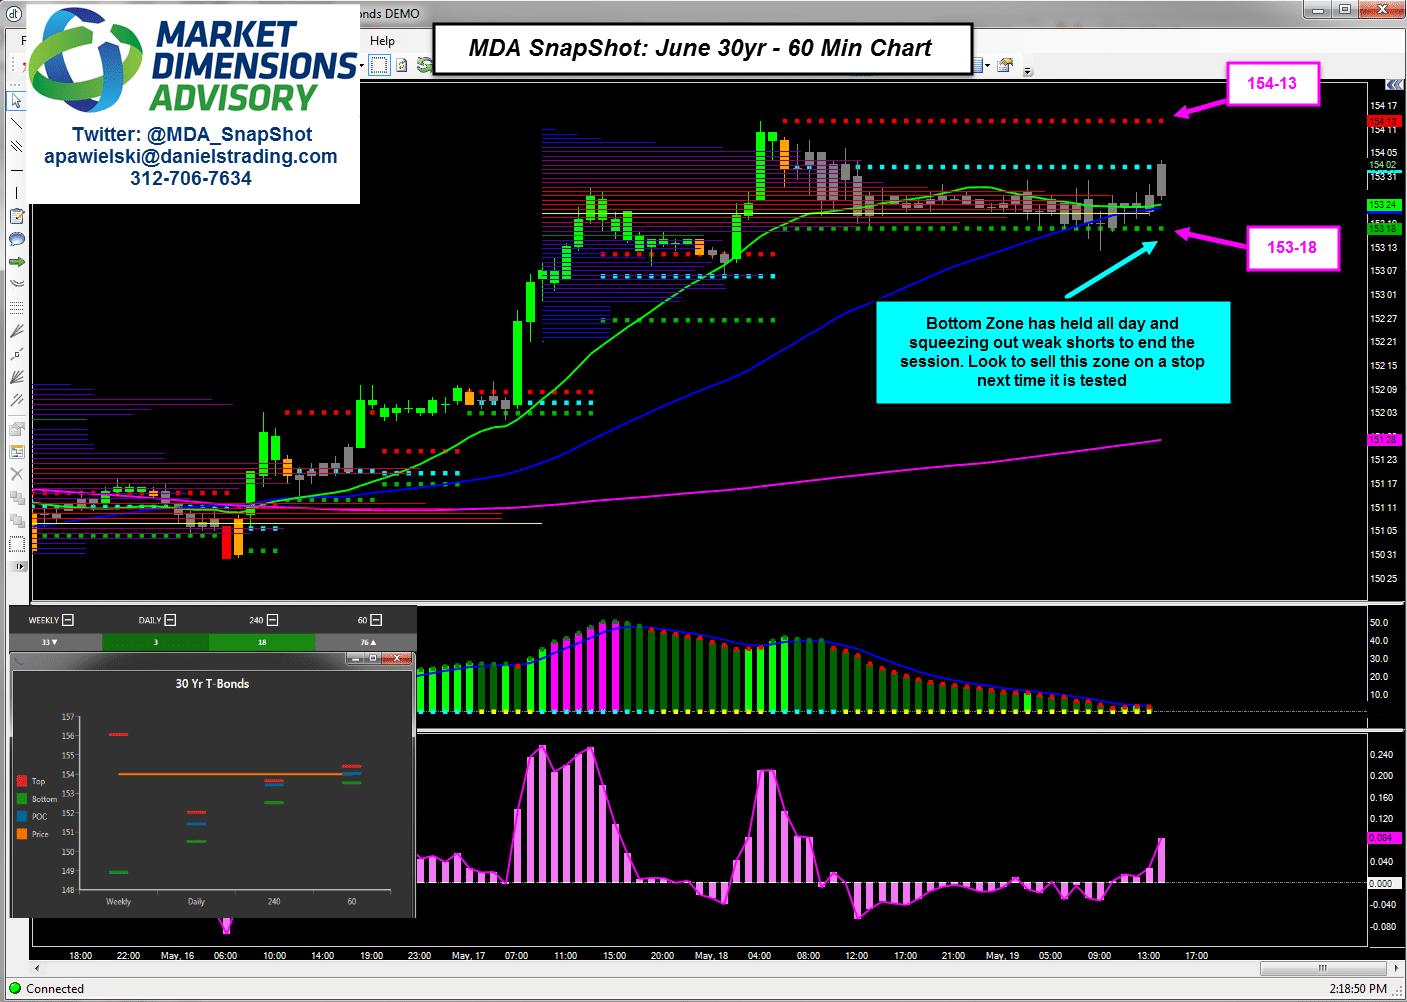 MDA SnapShot: June 30yr, 60 Min Levels, Sell zone? 5/19/17 ...